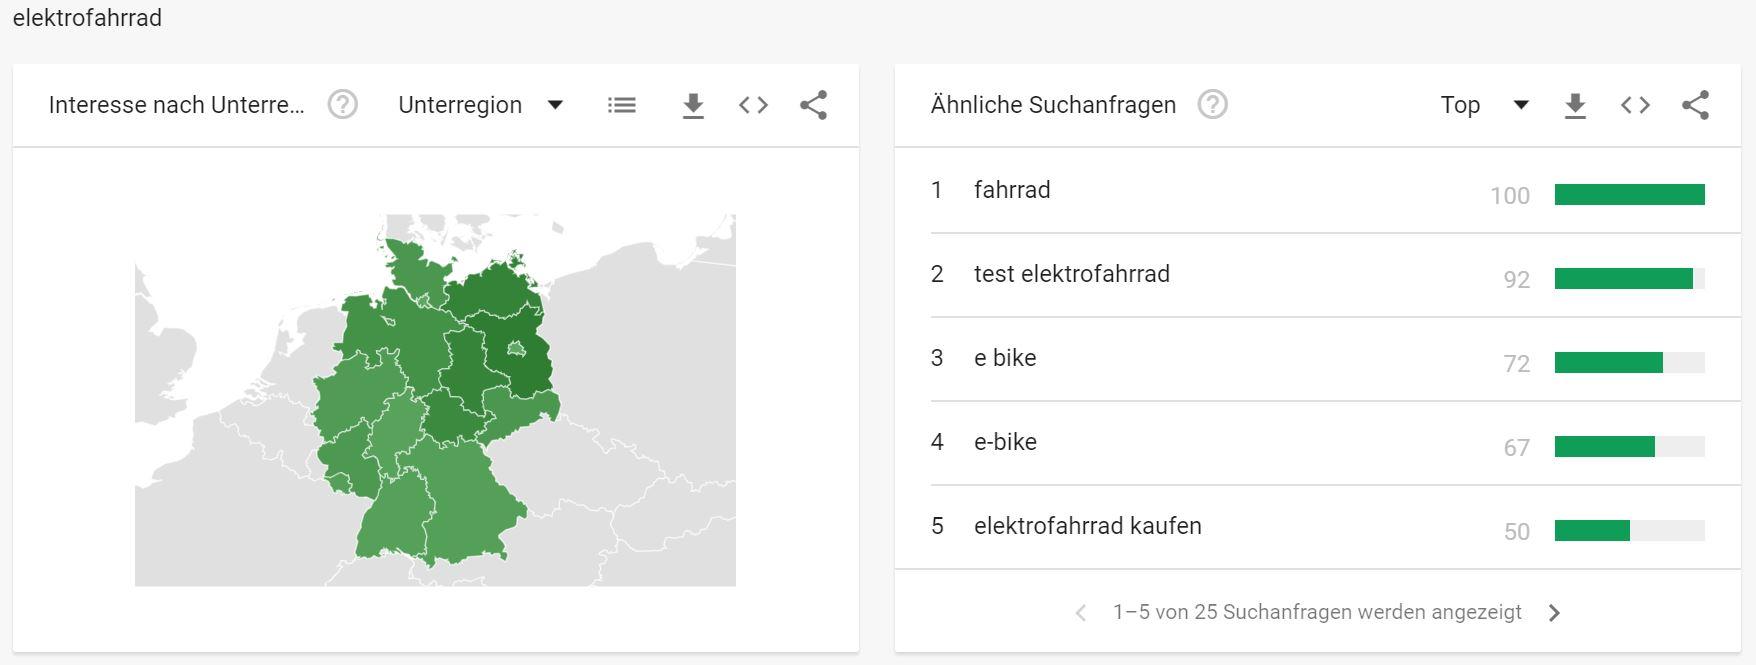 Google Trends - Interessante Suchbegriffe Fahrradbranche - Elektrofrahrrad